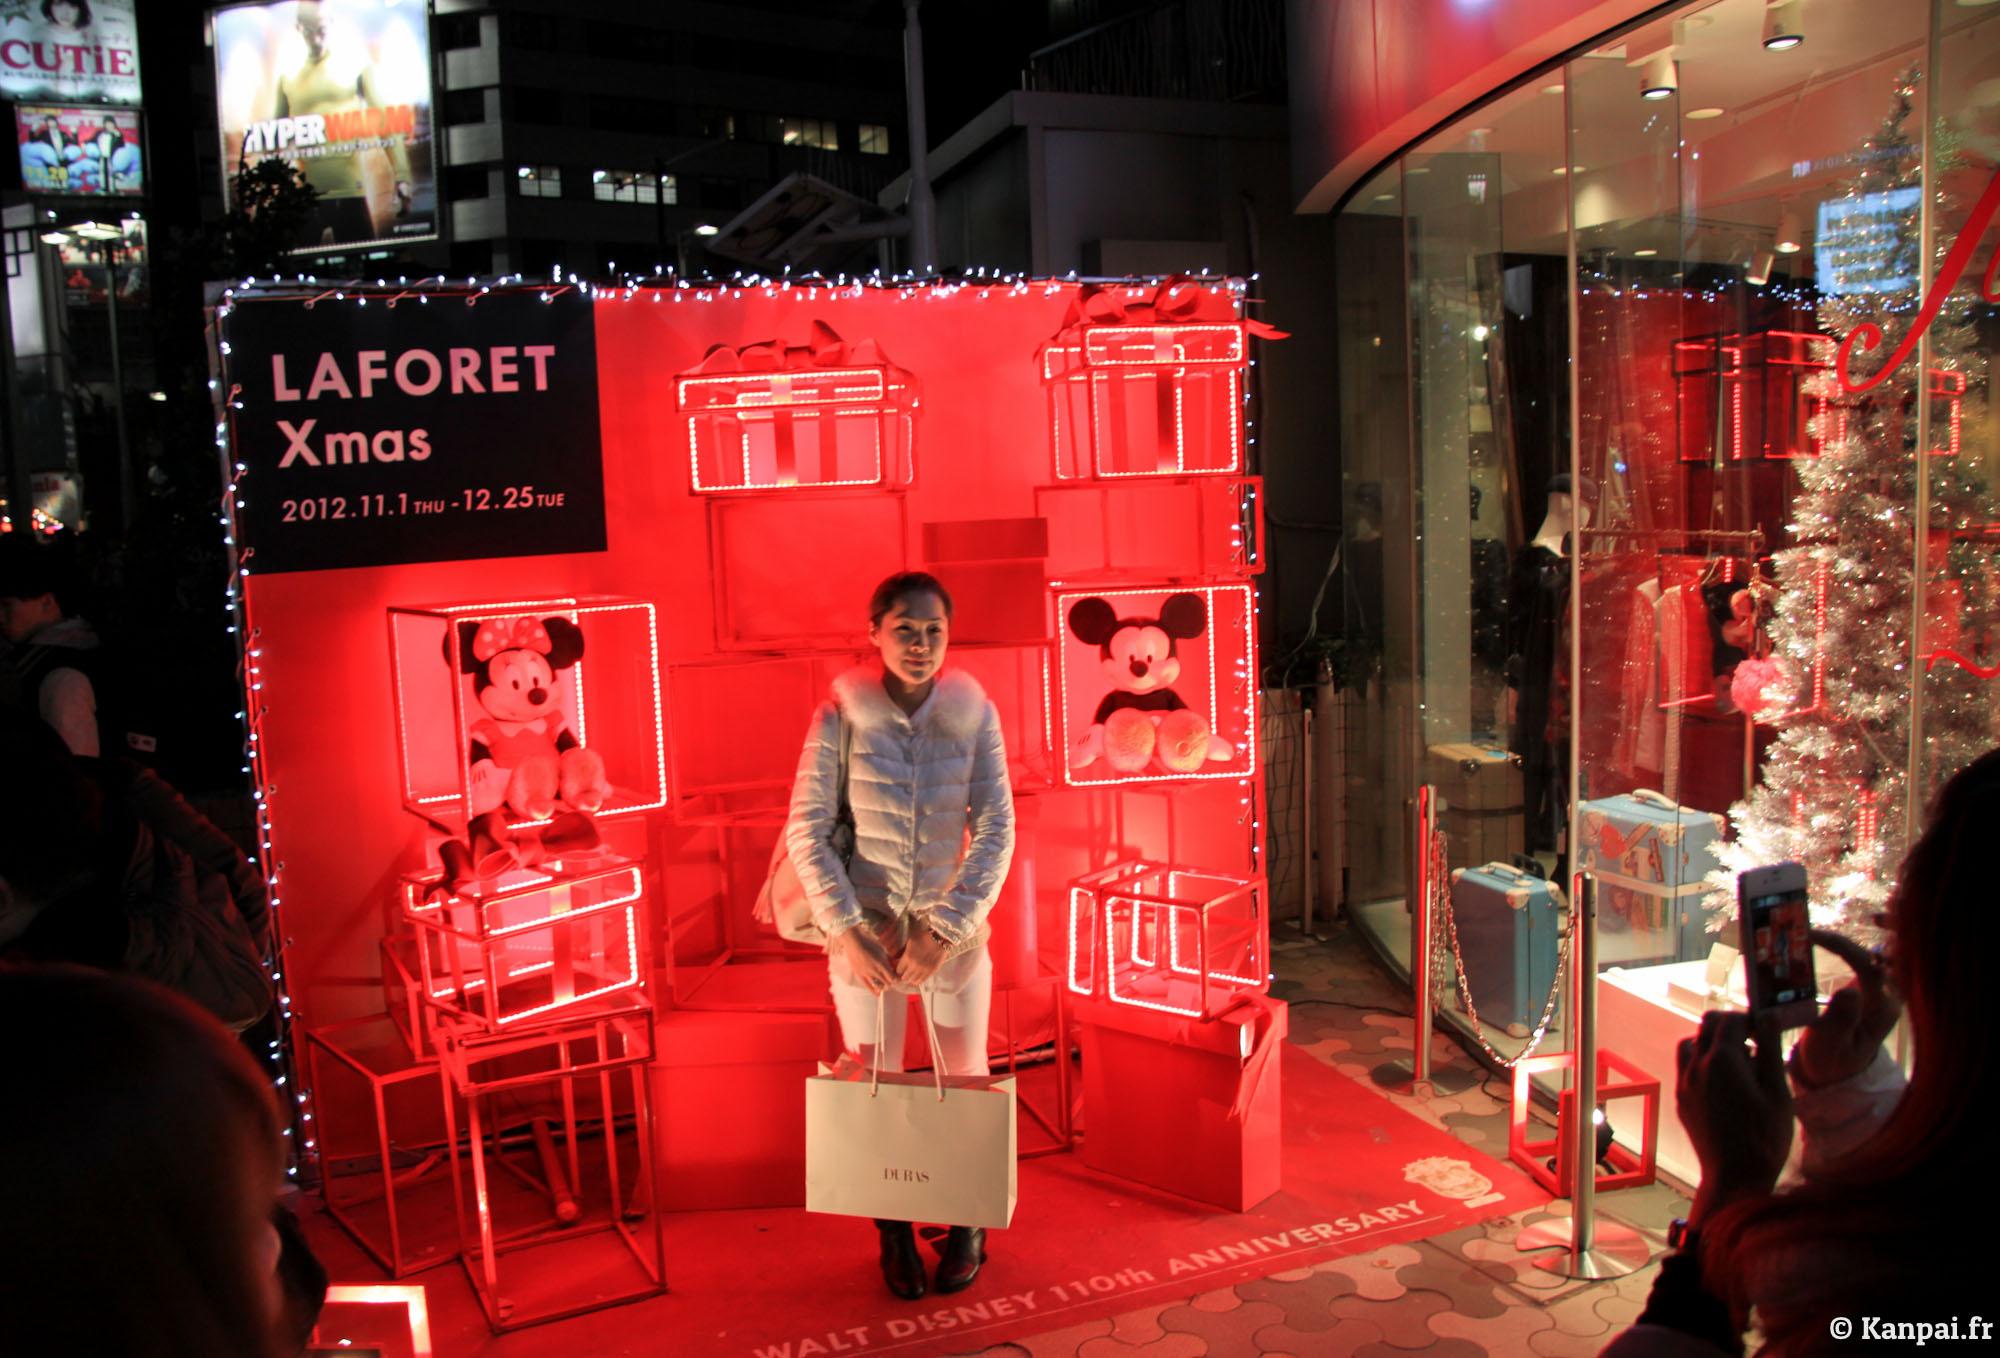 #B41817 Tokyo à Noël 5327 decorations de noel au japon 2000x1358 px @ aertt.com